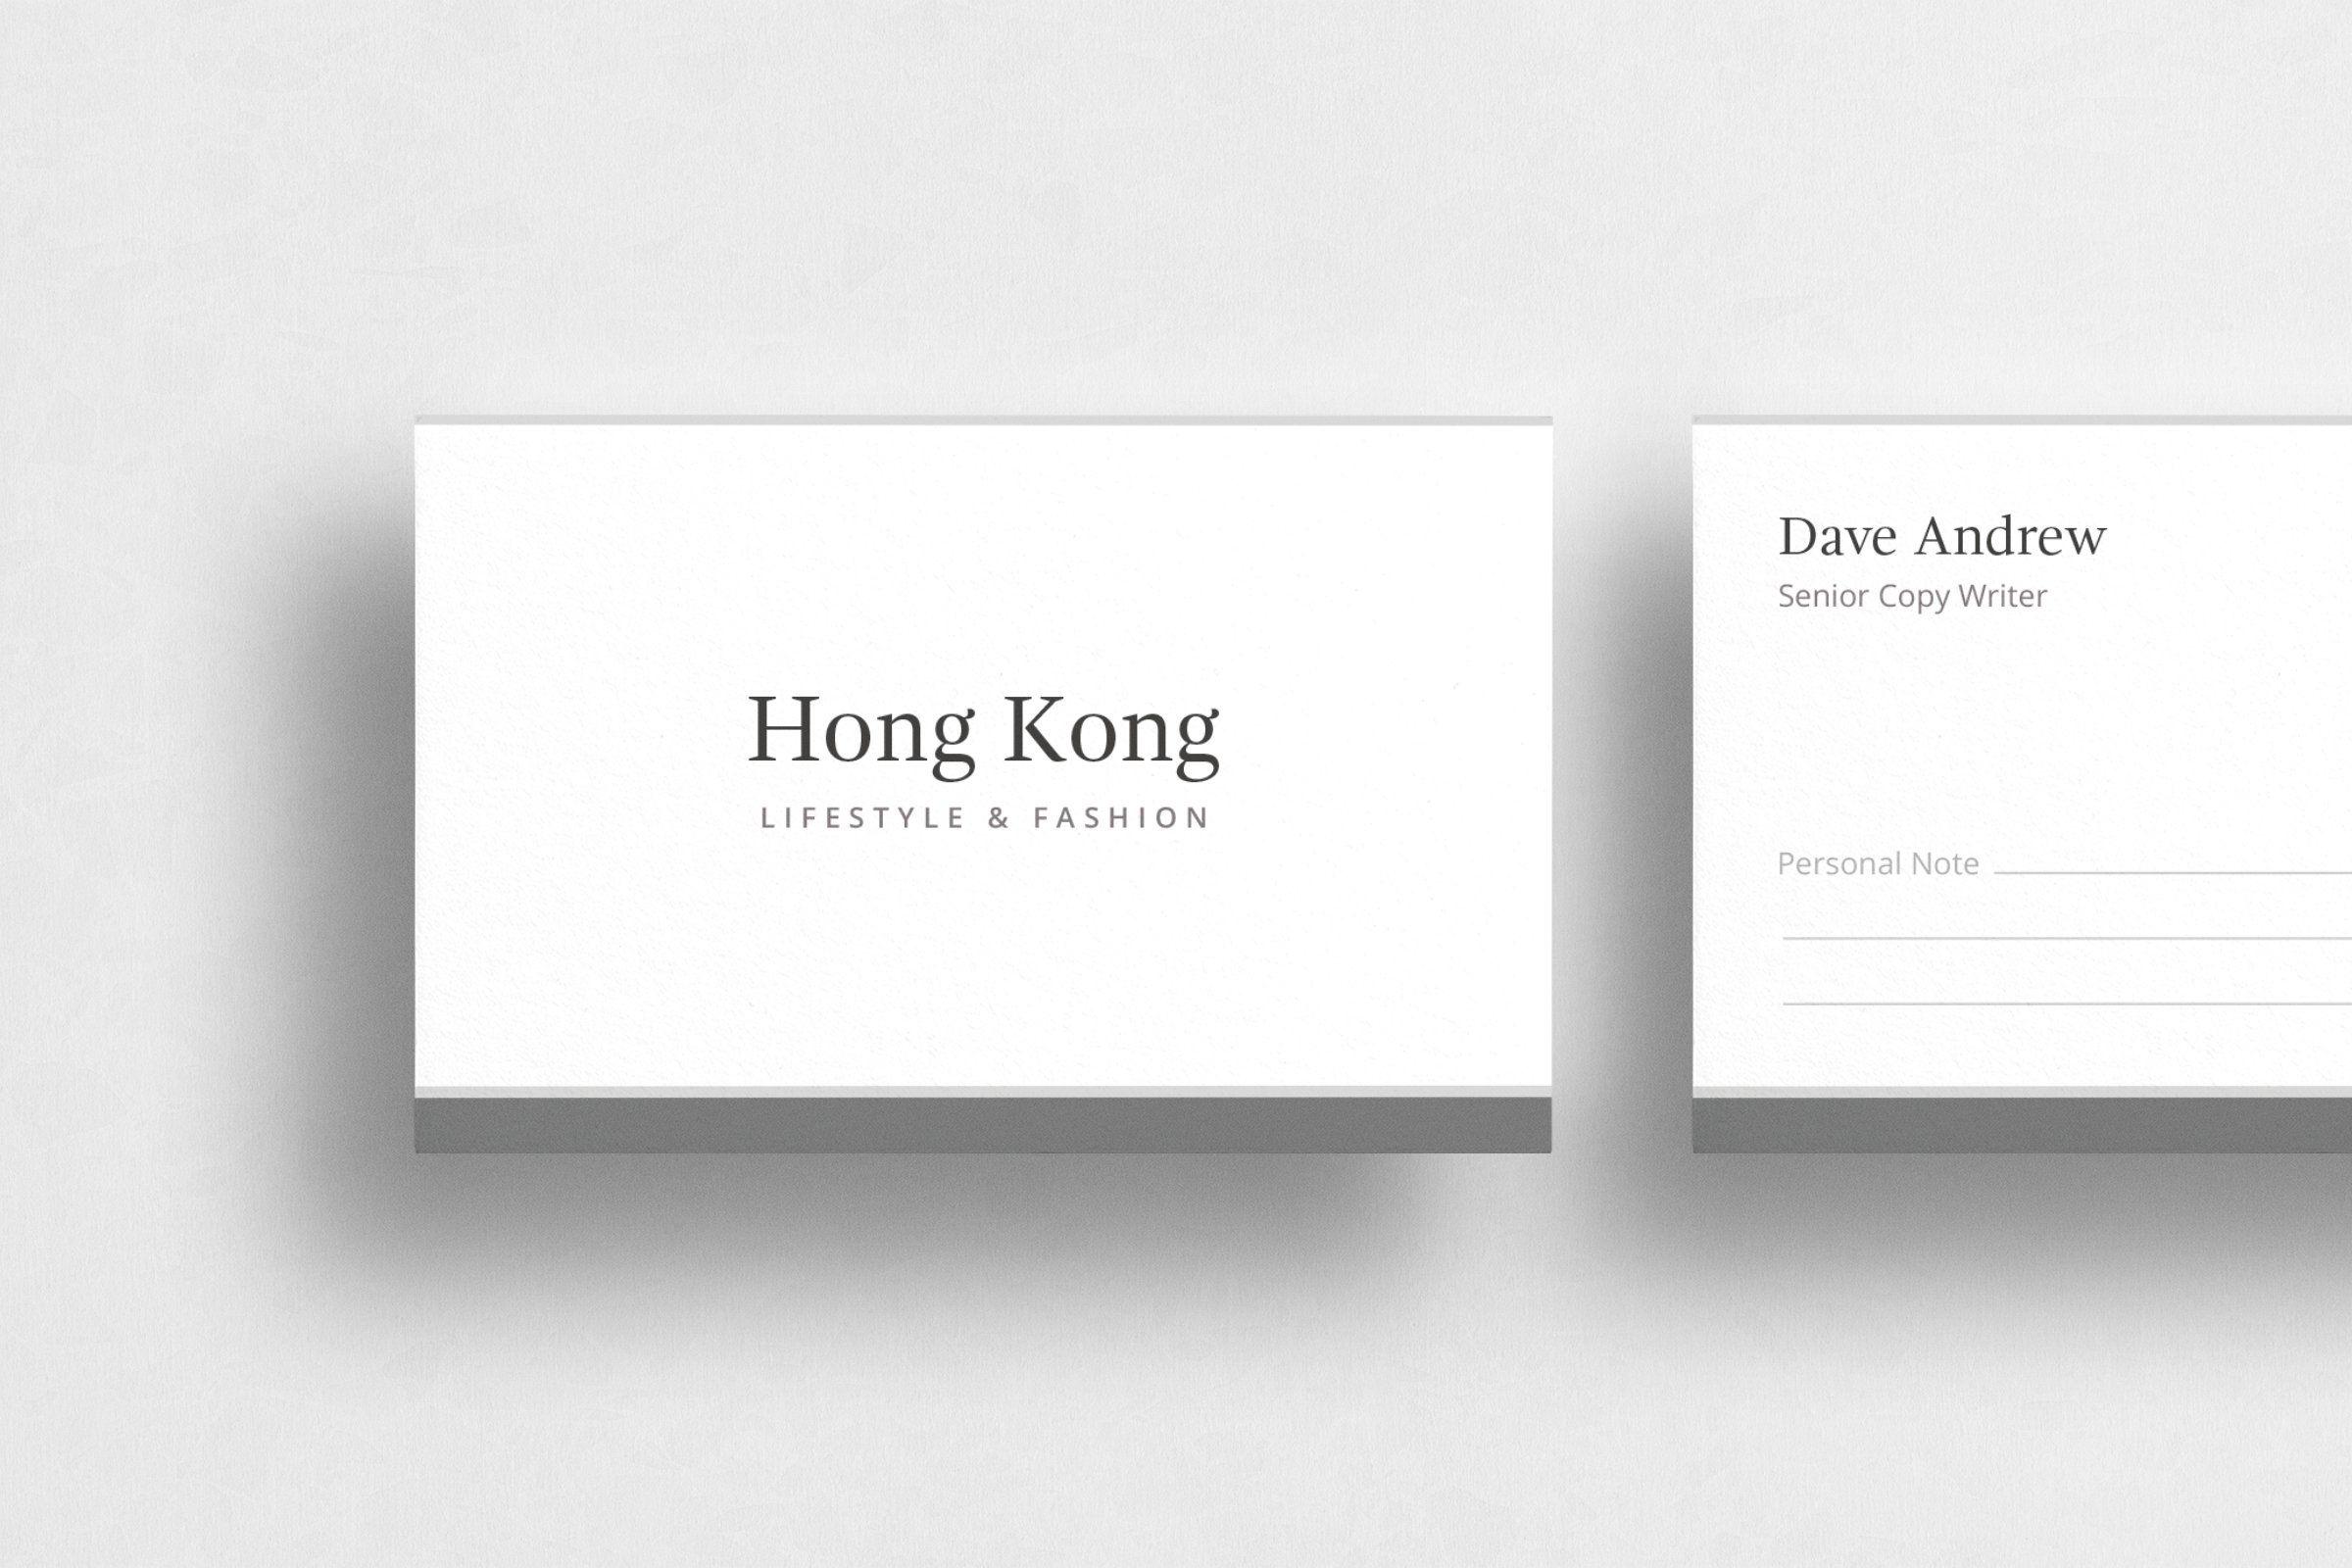 Hong Kong Business Card Elegant Business Cards Business Card Template Customizable Business Cards Templates